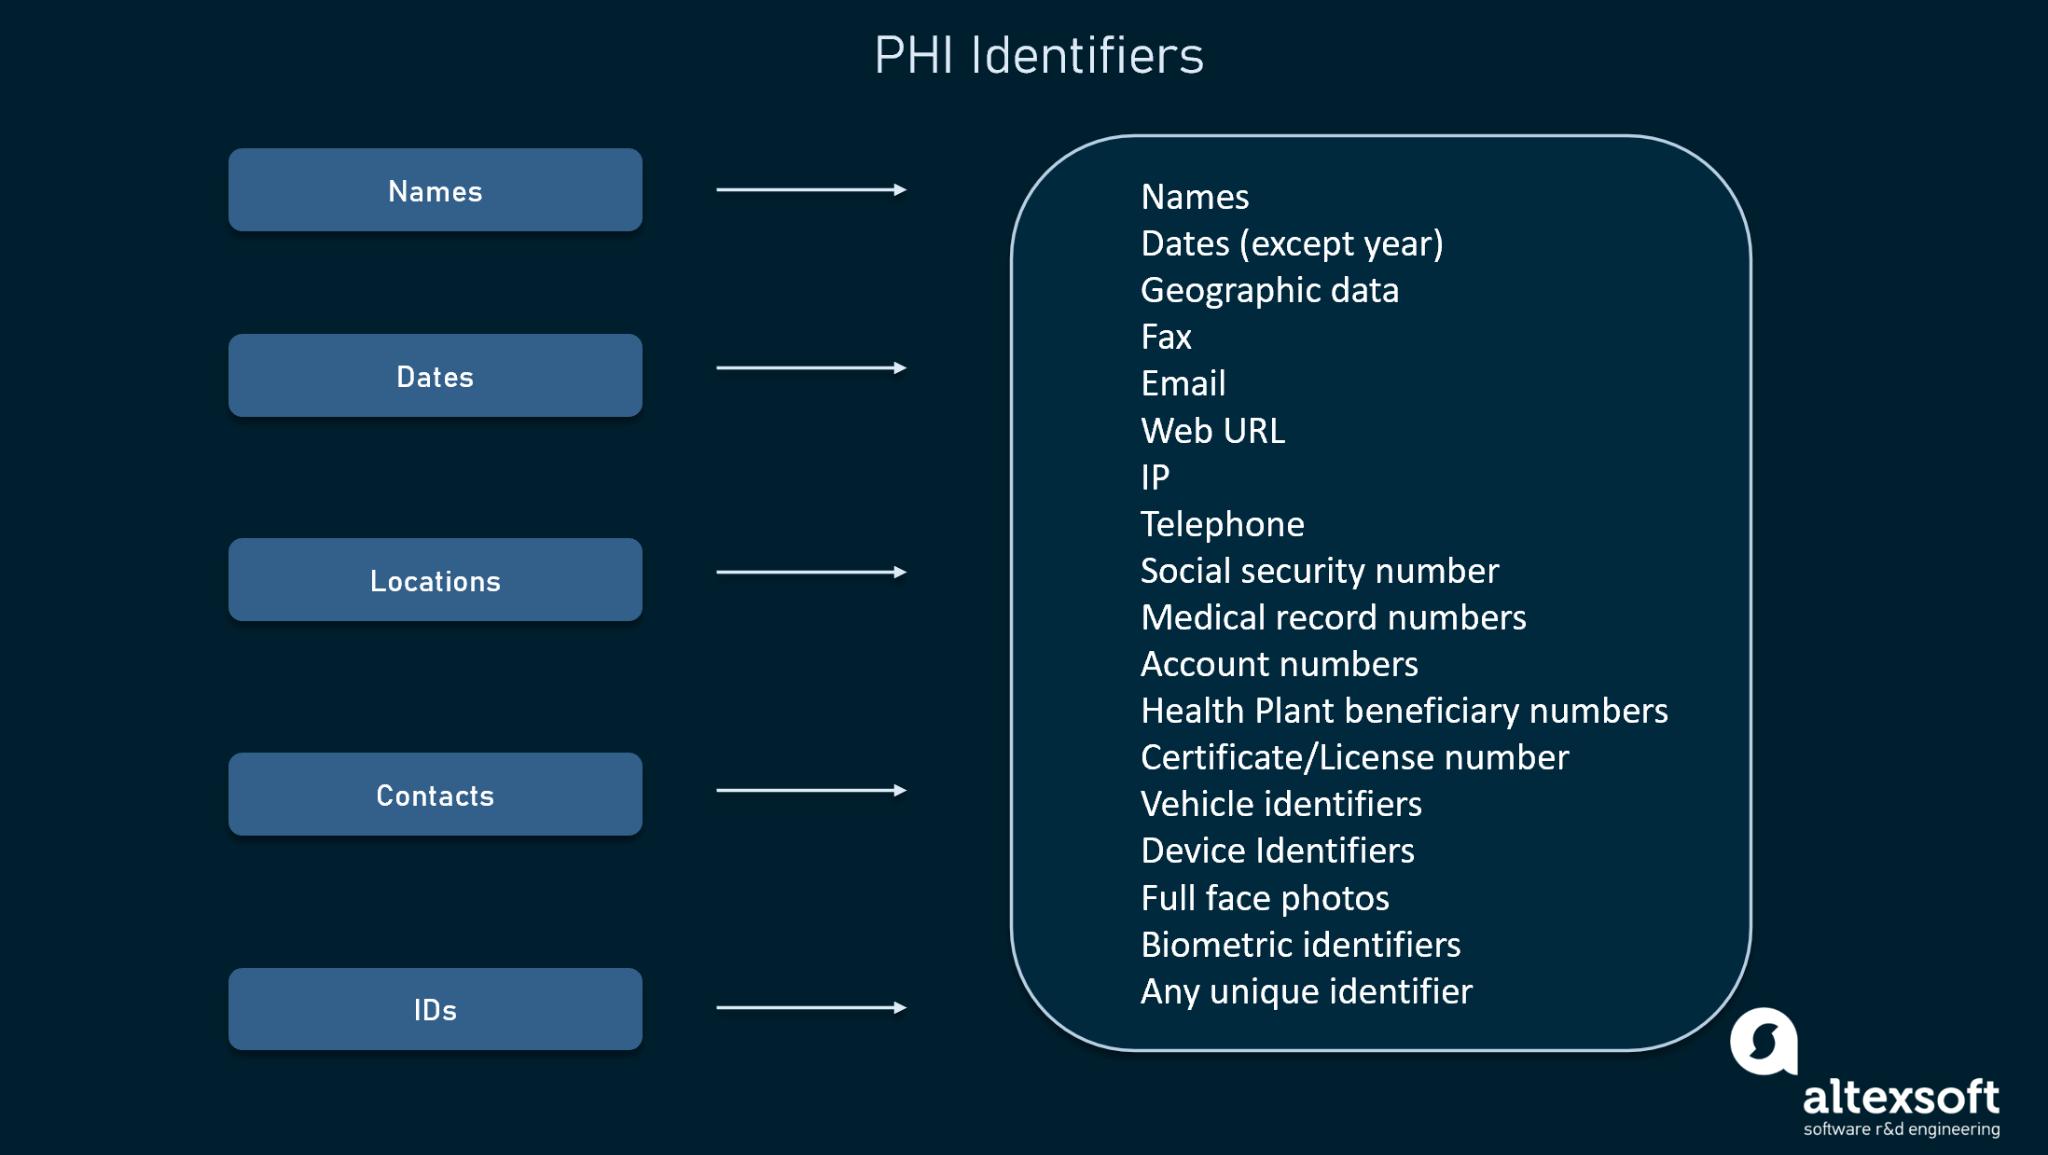 PHI Identifiers